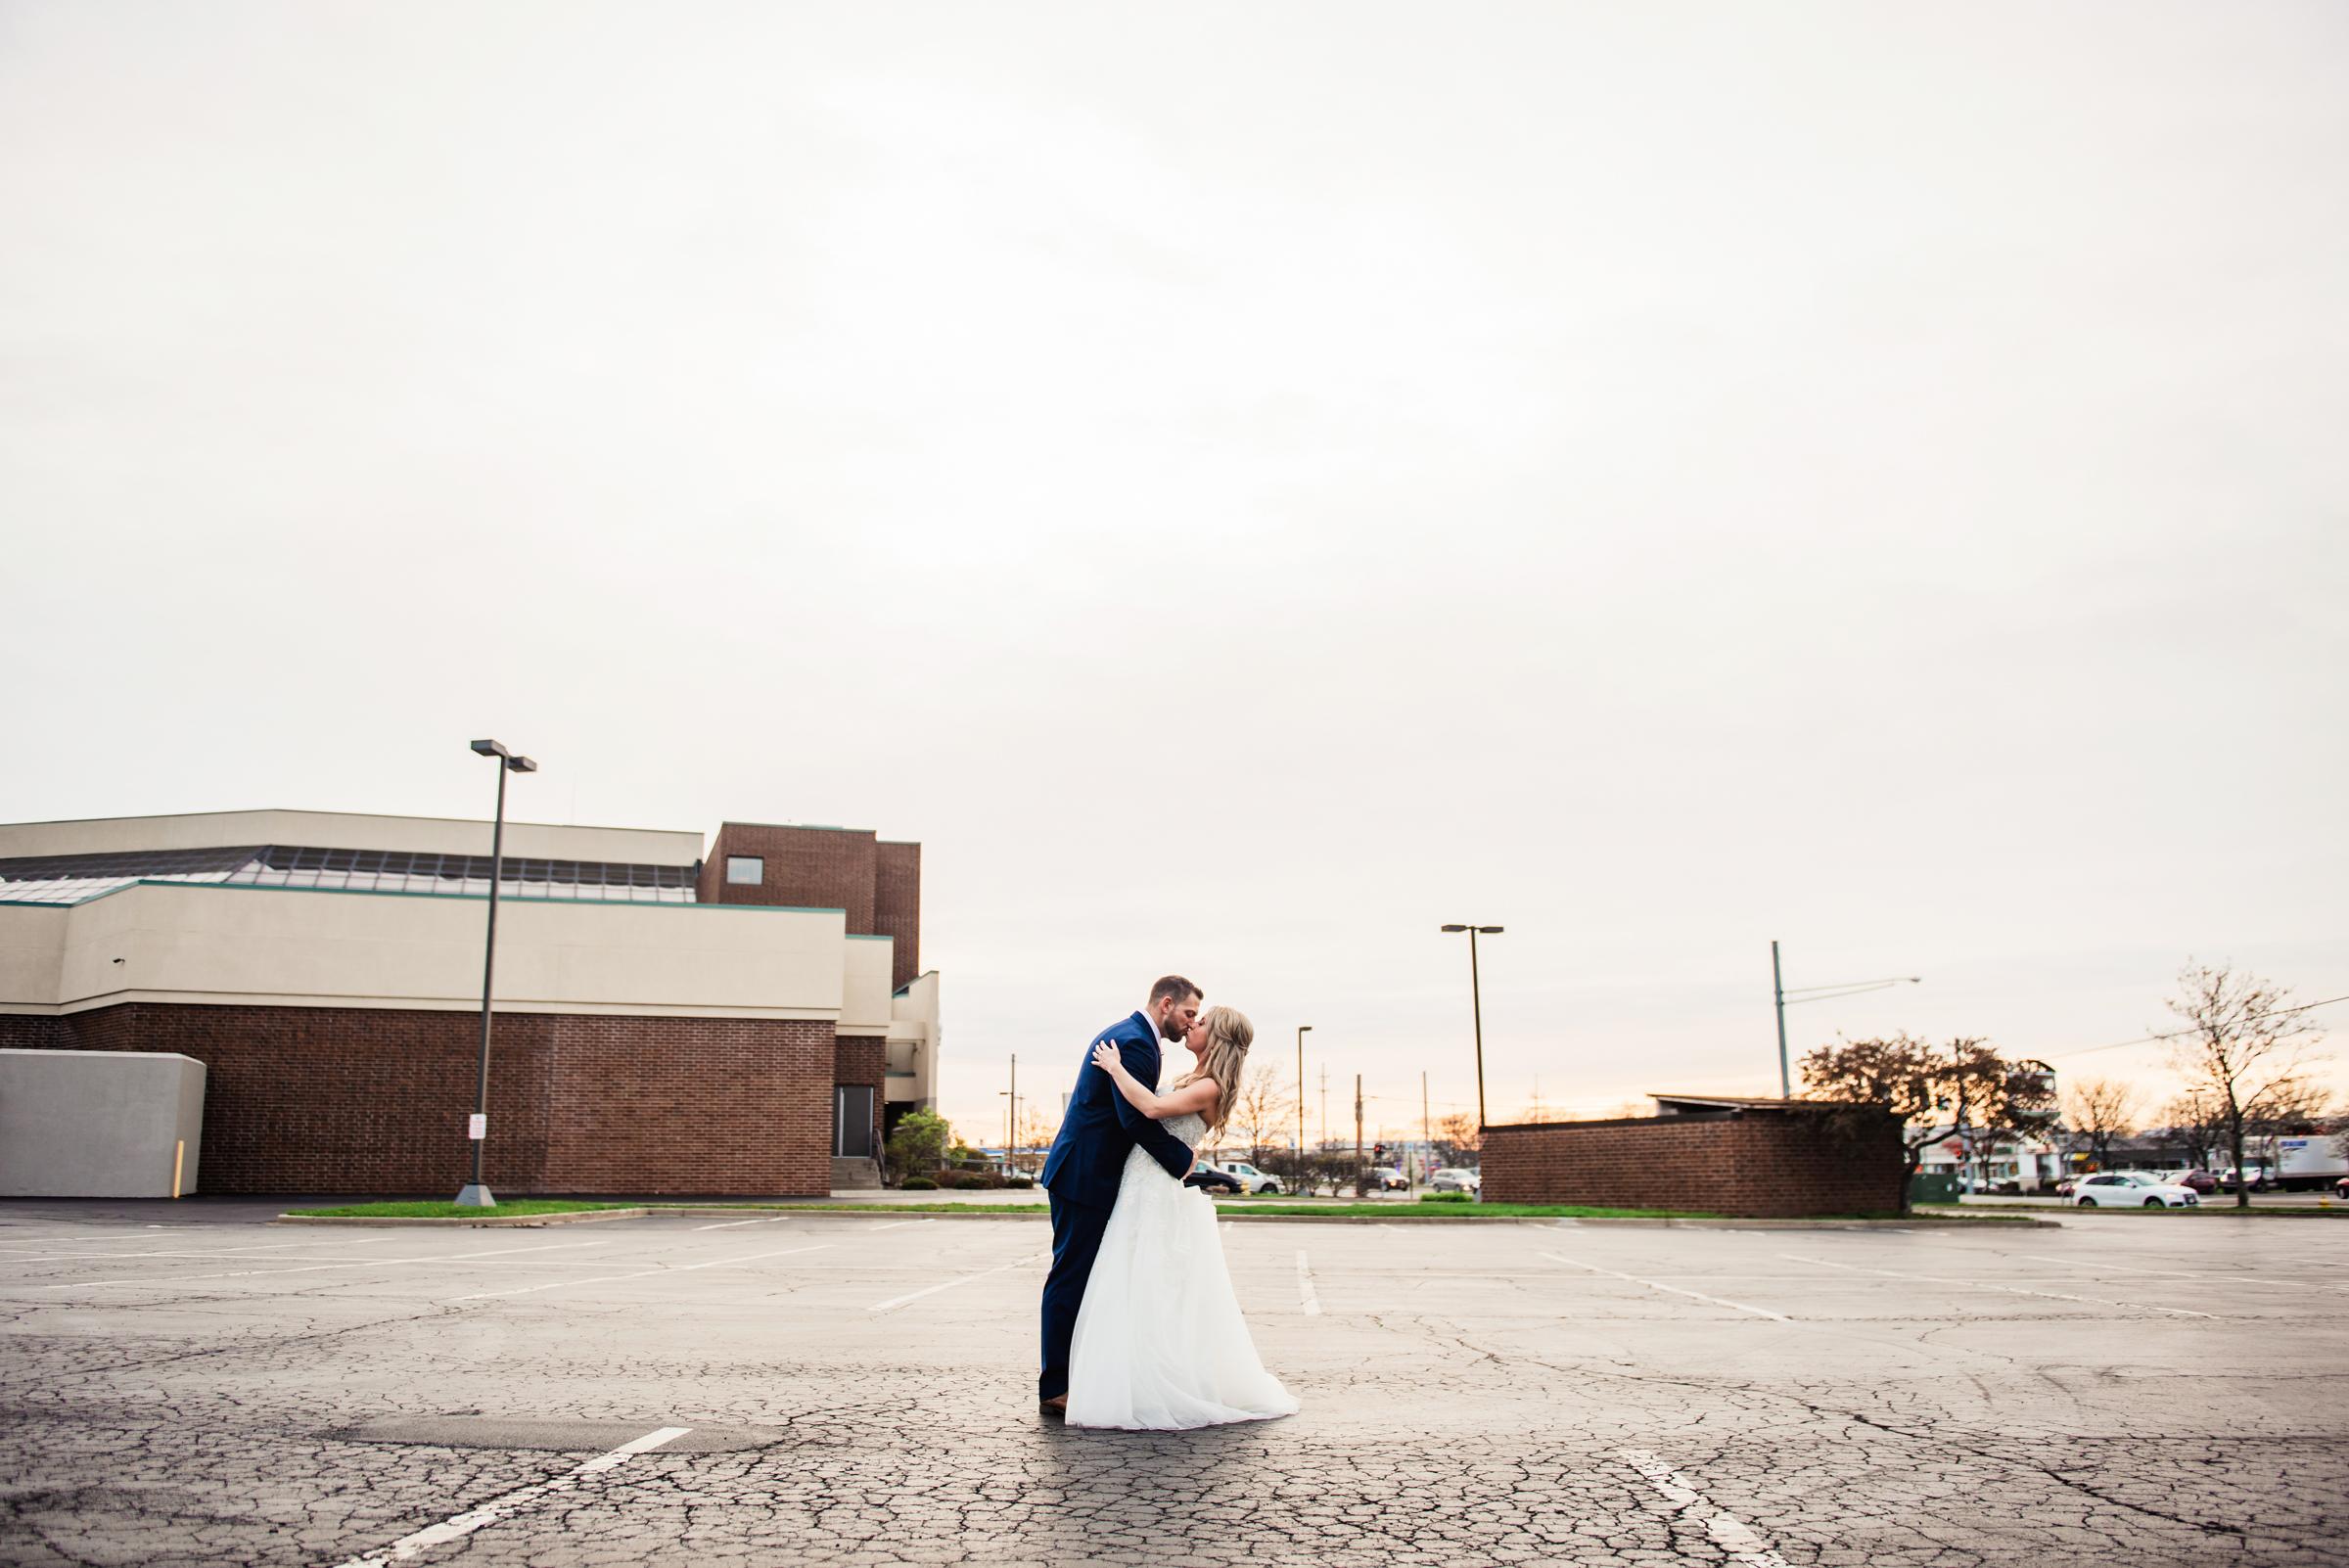 Double_Tree_by_Hilton_Rochester_Wedding_JILL_STUDIO_Rochester_NY_Photographer_DSC_4618.jpg